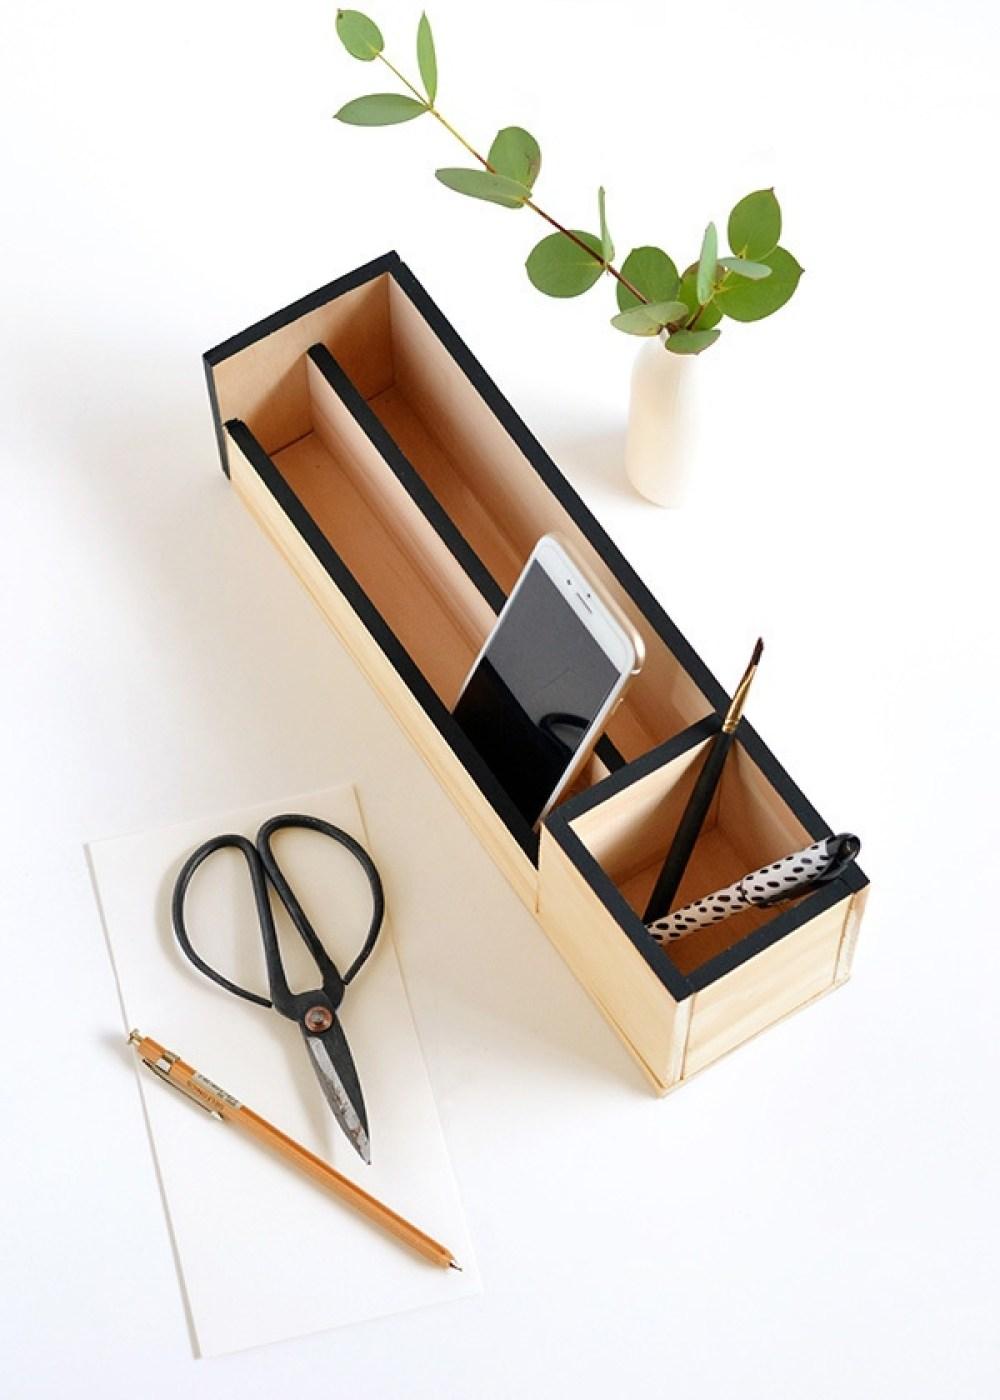 DIY Desk Organizer   15 Stylish DIY Projects for Organizing Your Home #organizing #diy #diyhome #clutterbustingtips